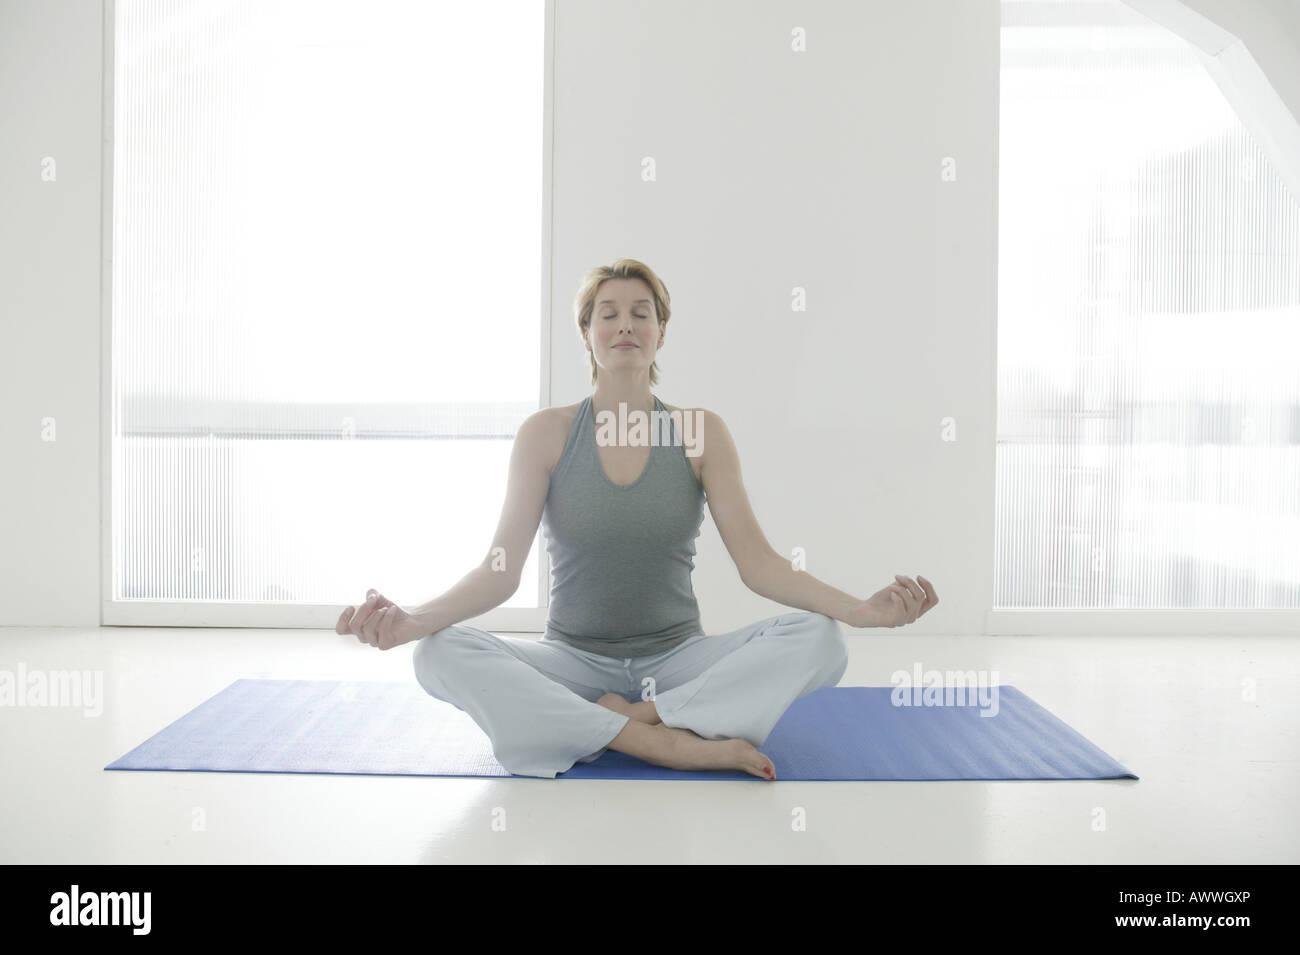 A woman sitting cross legged on a yoga mat meditating - Stock Image